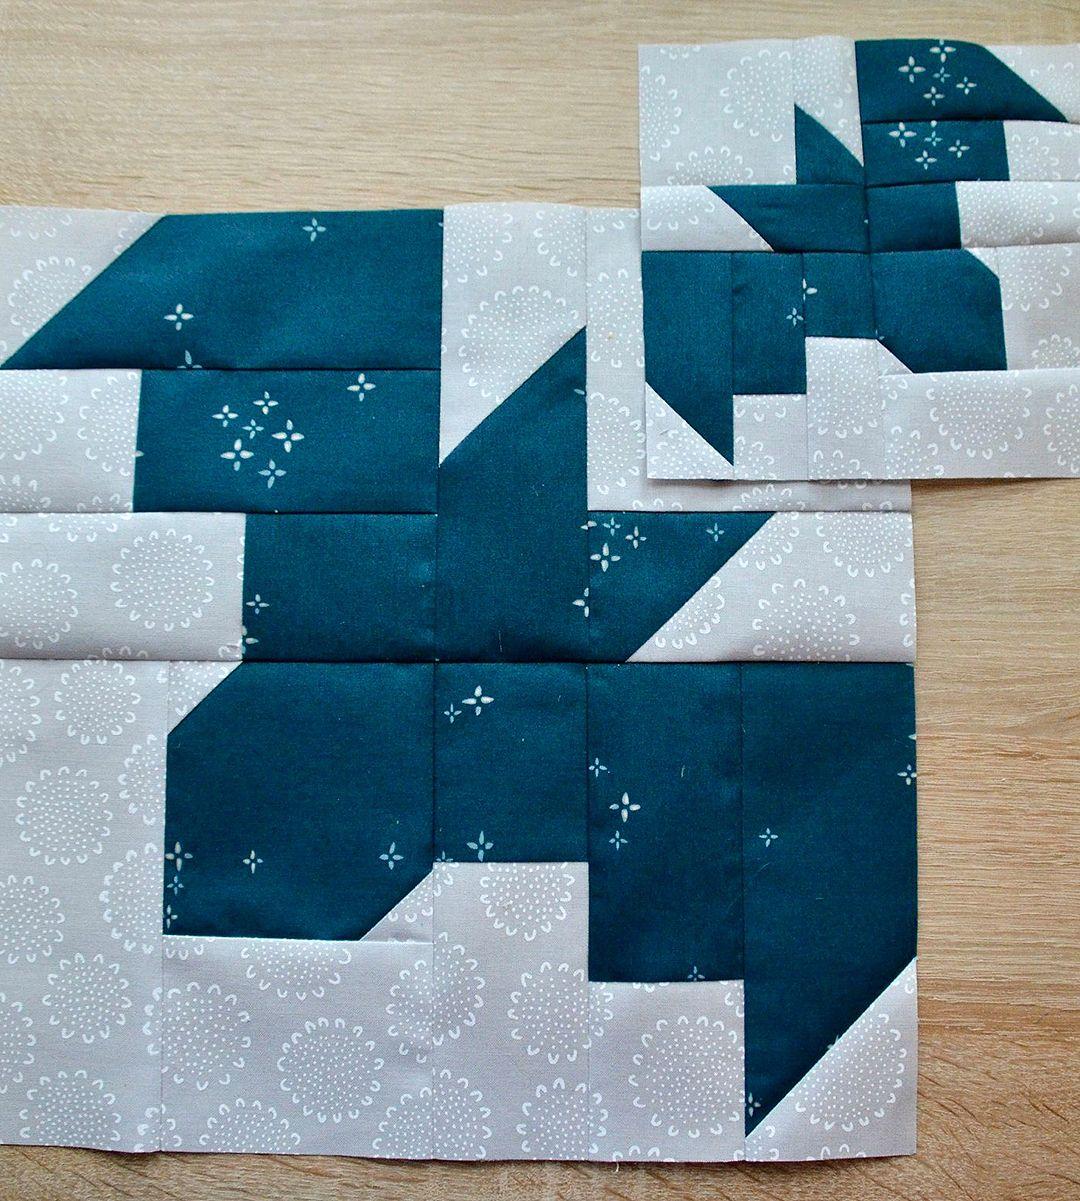 New Halloween Quilt Patterns: Bat Quilt Pattern - ellis & higgs